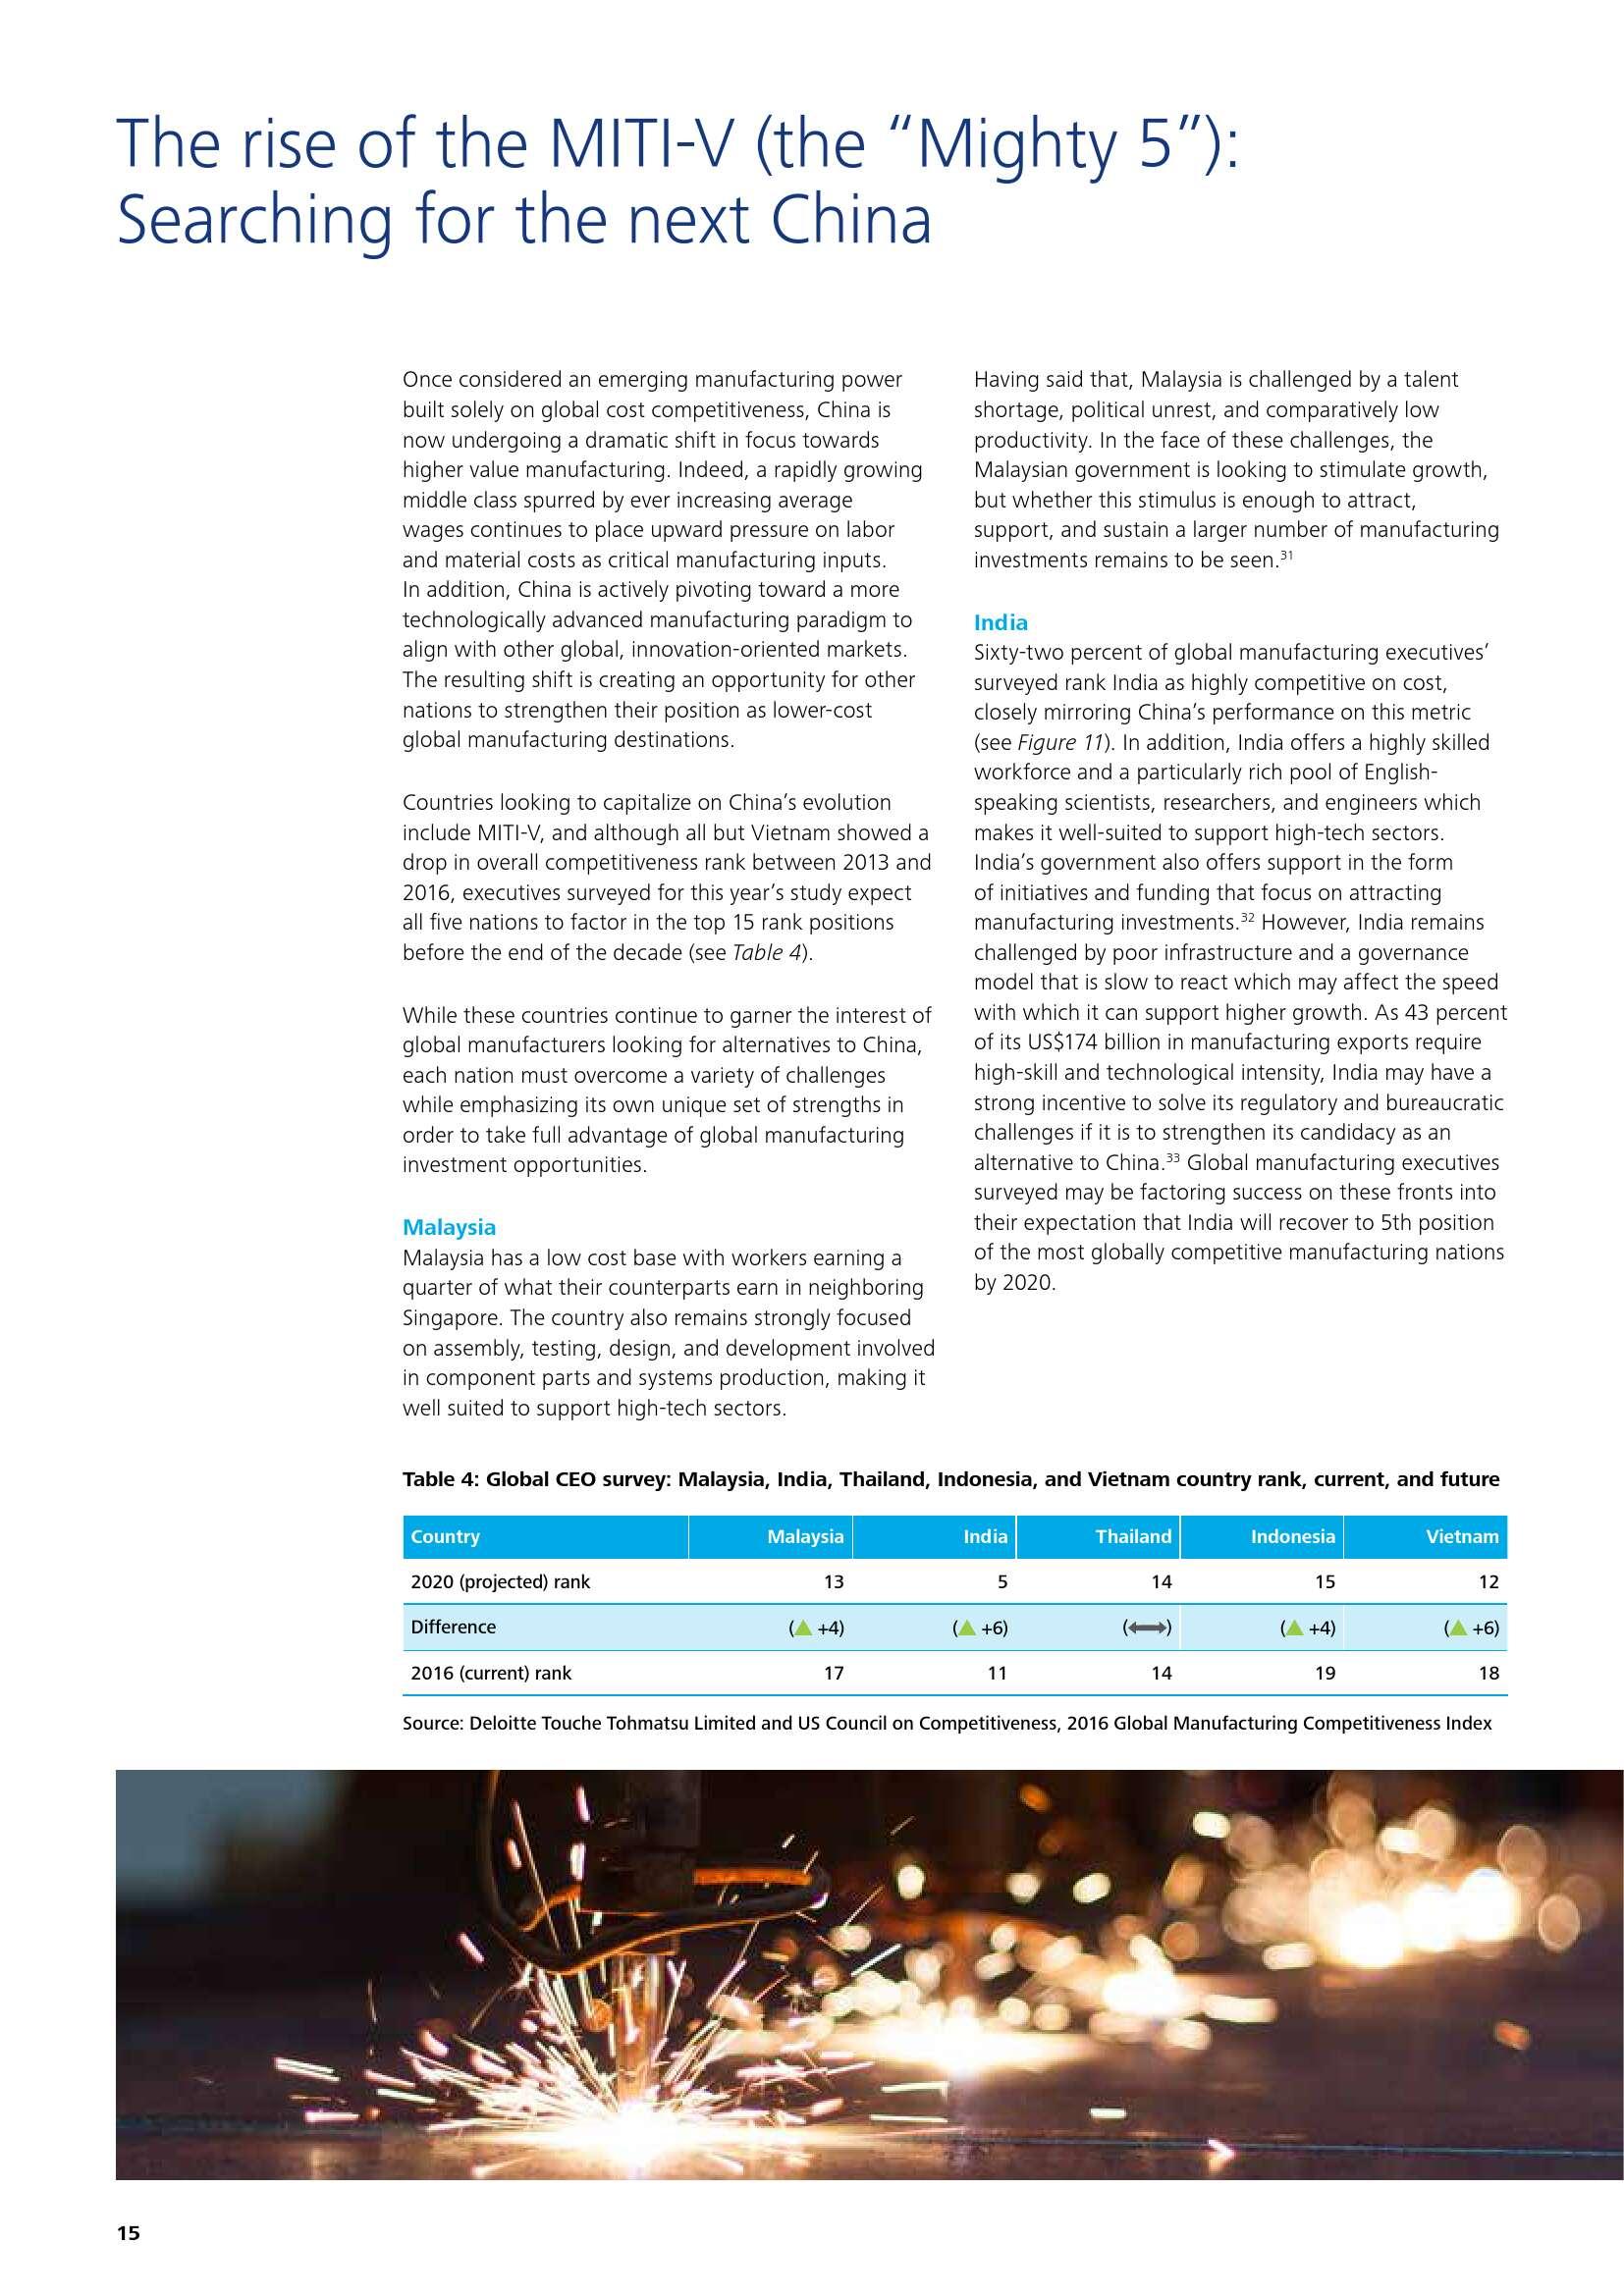 deloitte-cn-global-mfg-competitiveness-index-2016-en-160401_000018